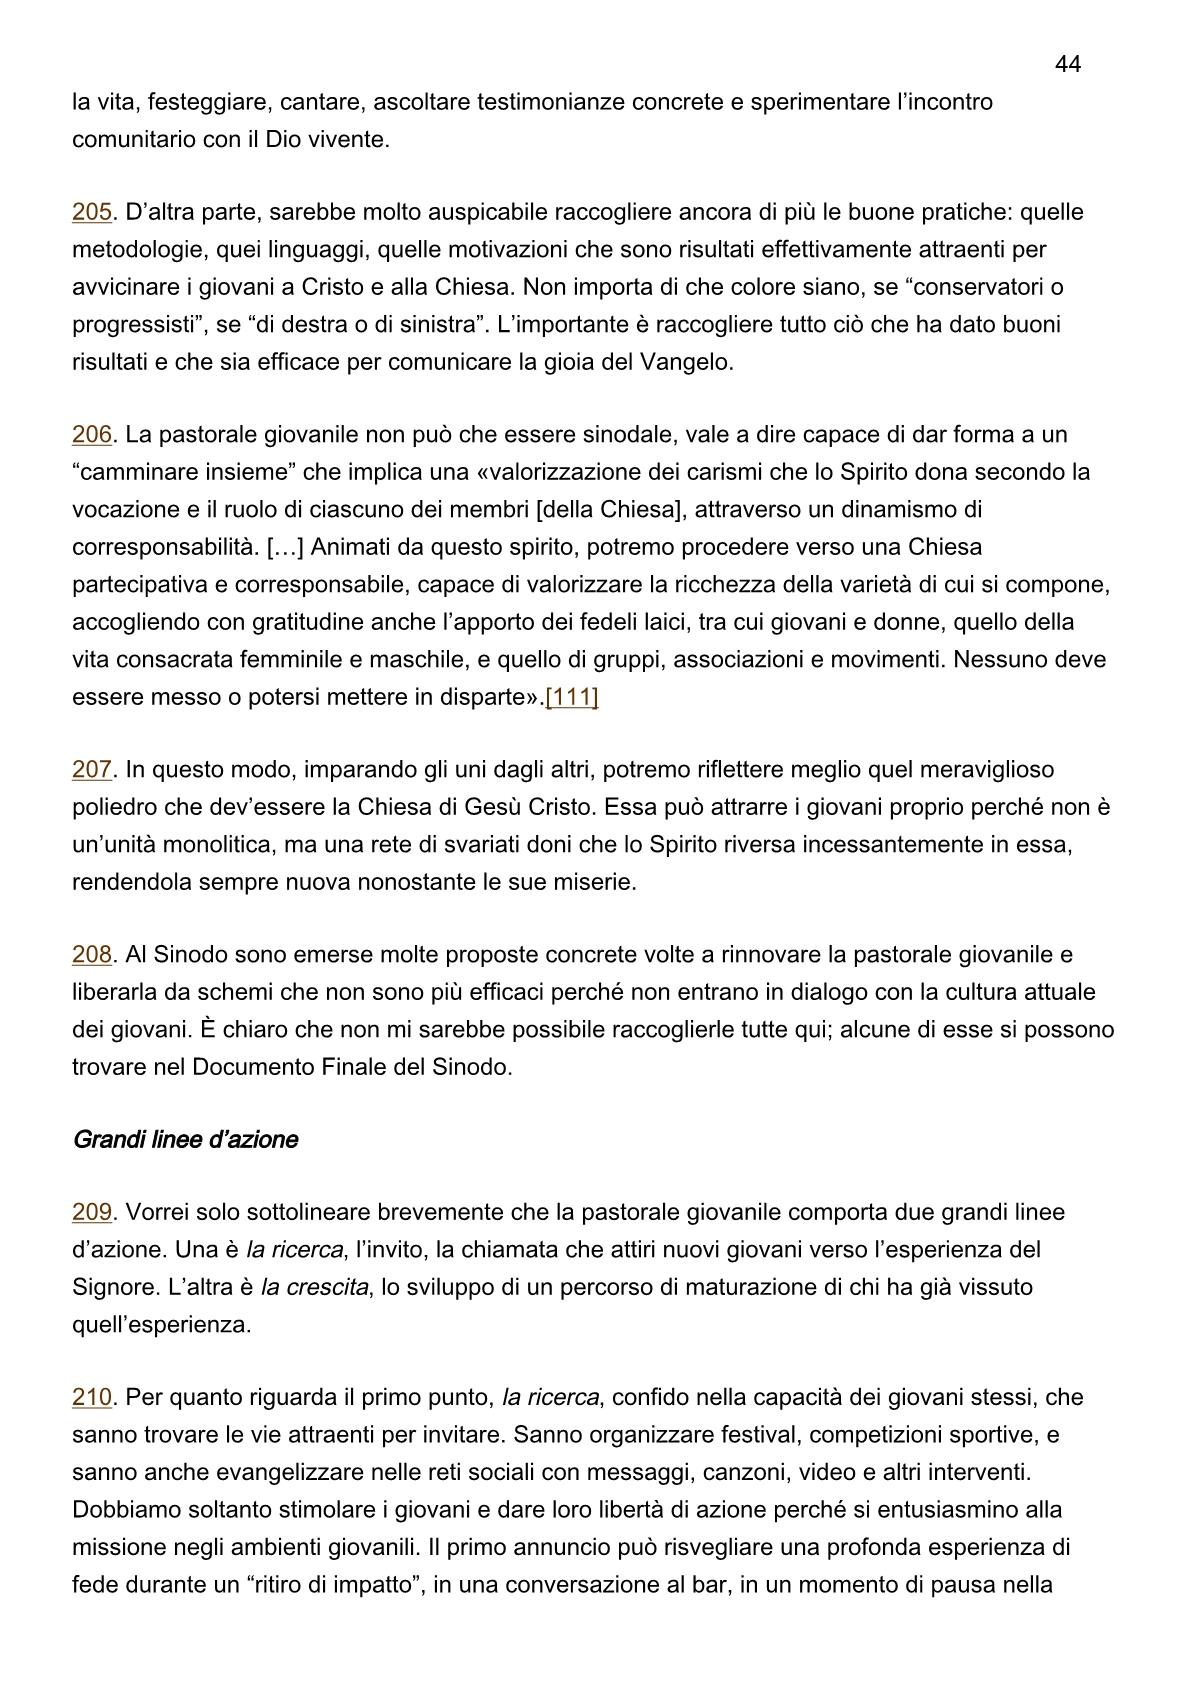 papa-francesco_esortazione-ap_20190325_christus-vivit44